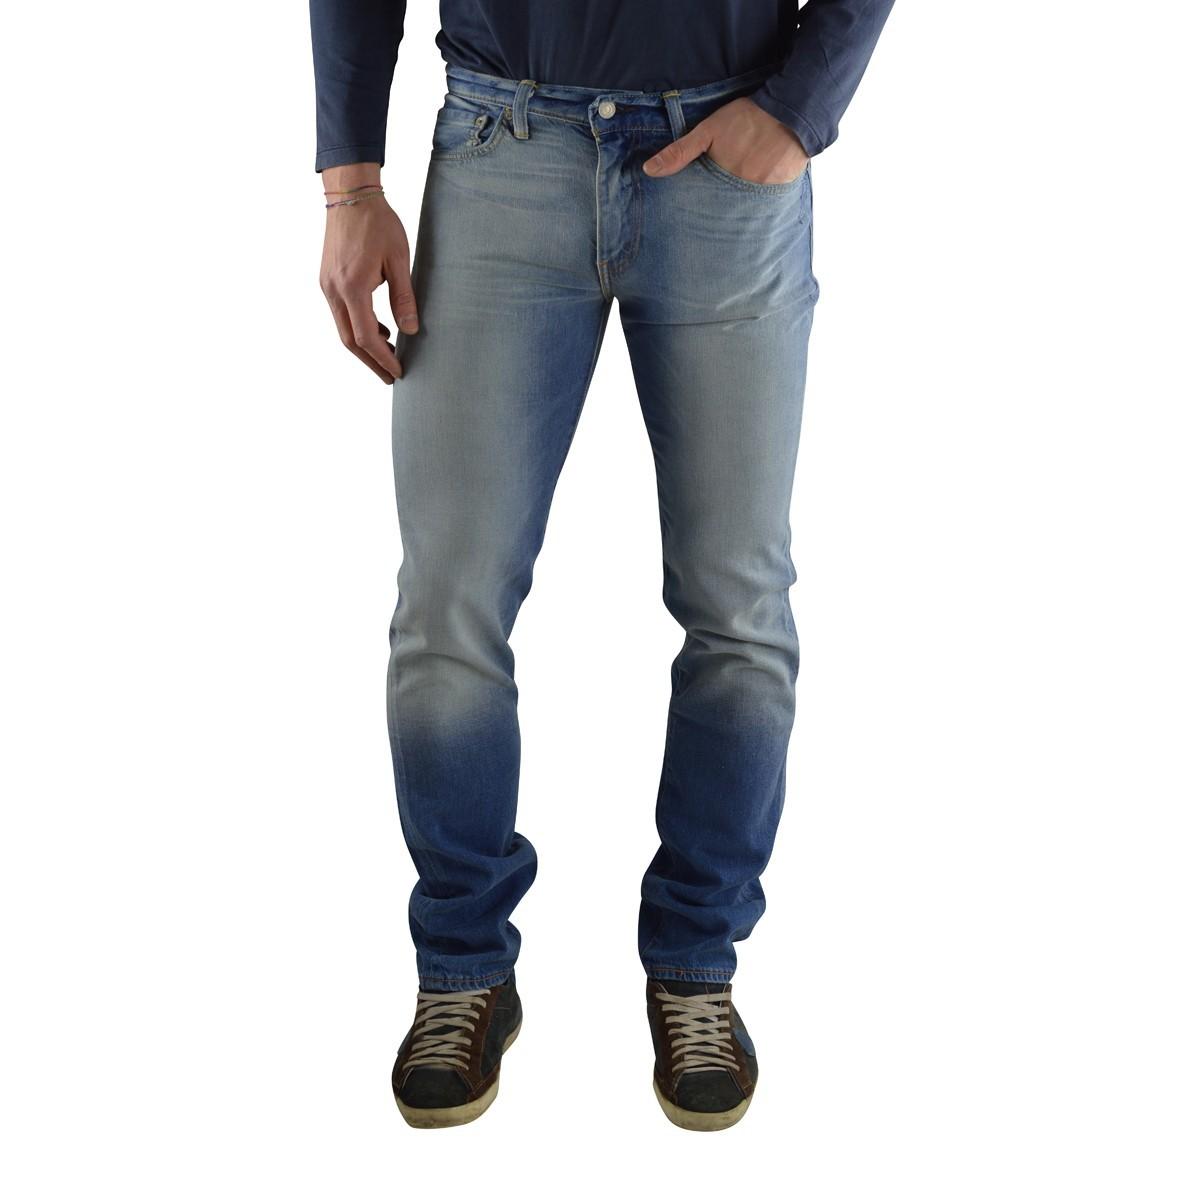 Levi's Uomo Jeans Levi's 511 Slim Fit Homie Uomo 5111098A